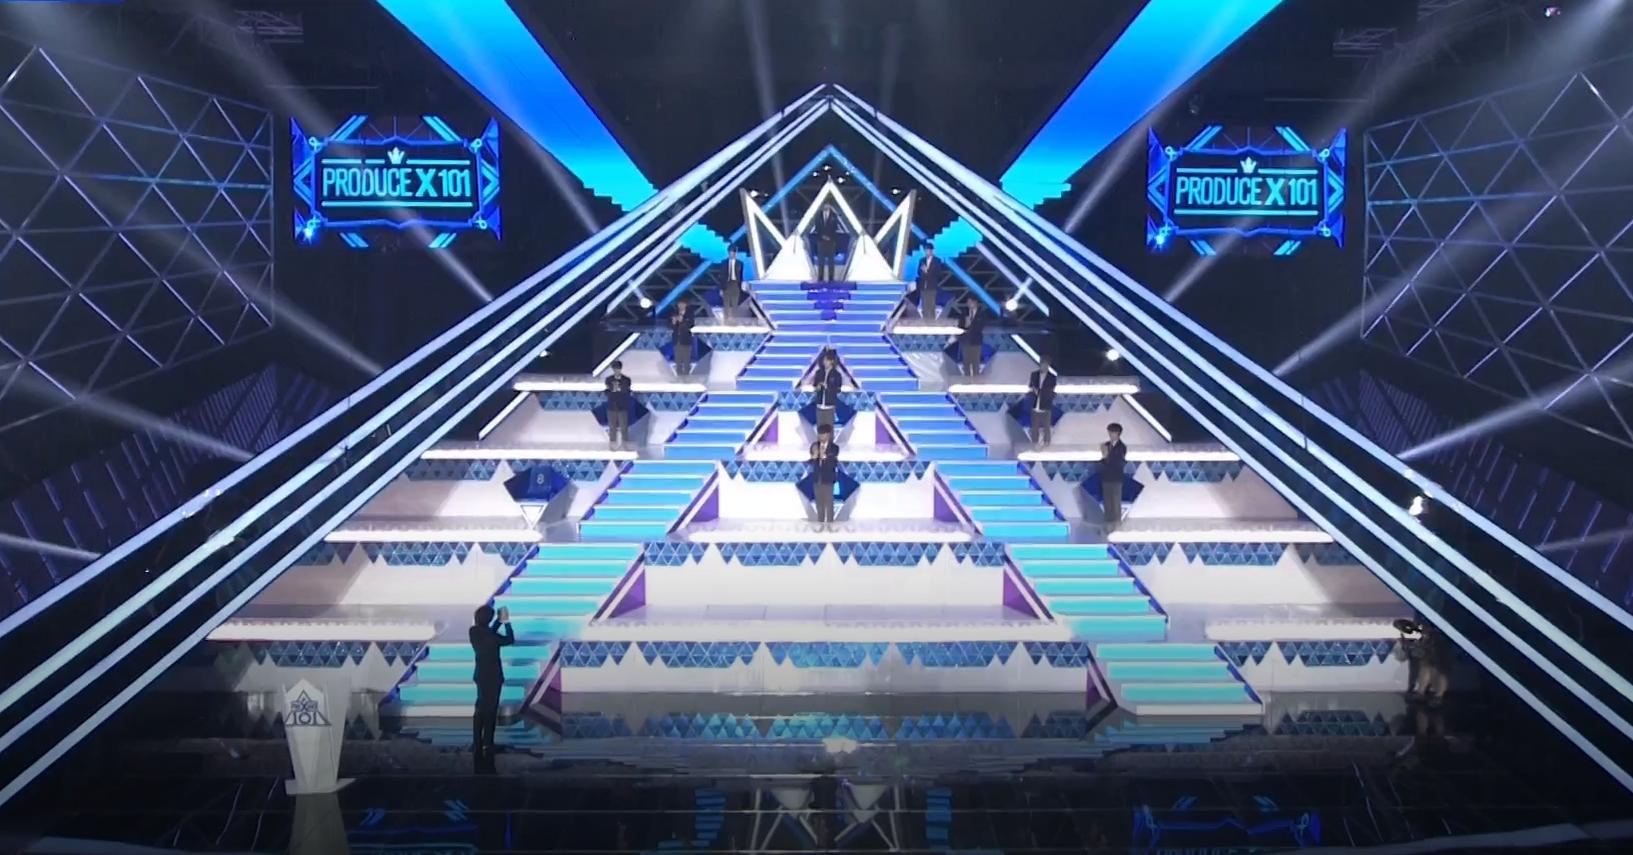 Screenshot from Naver TV